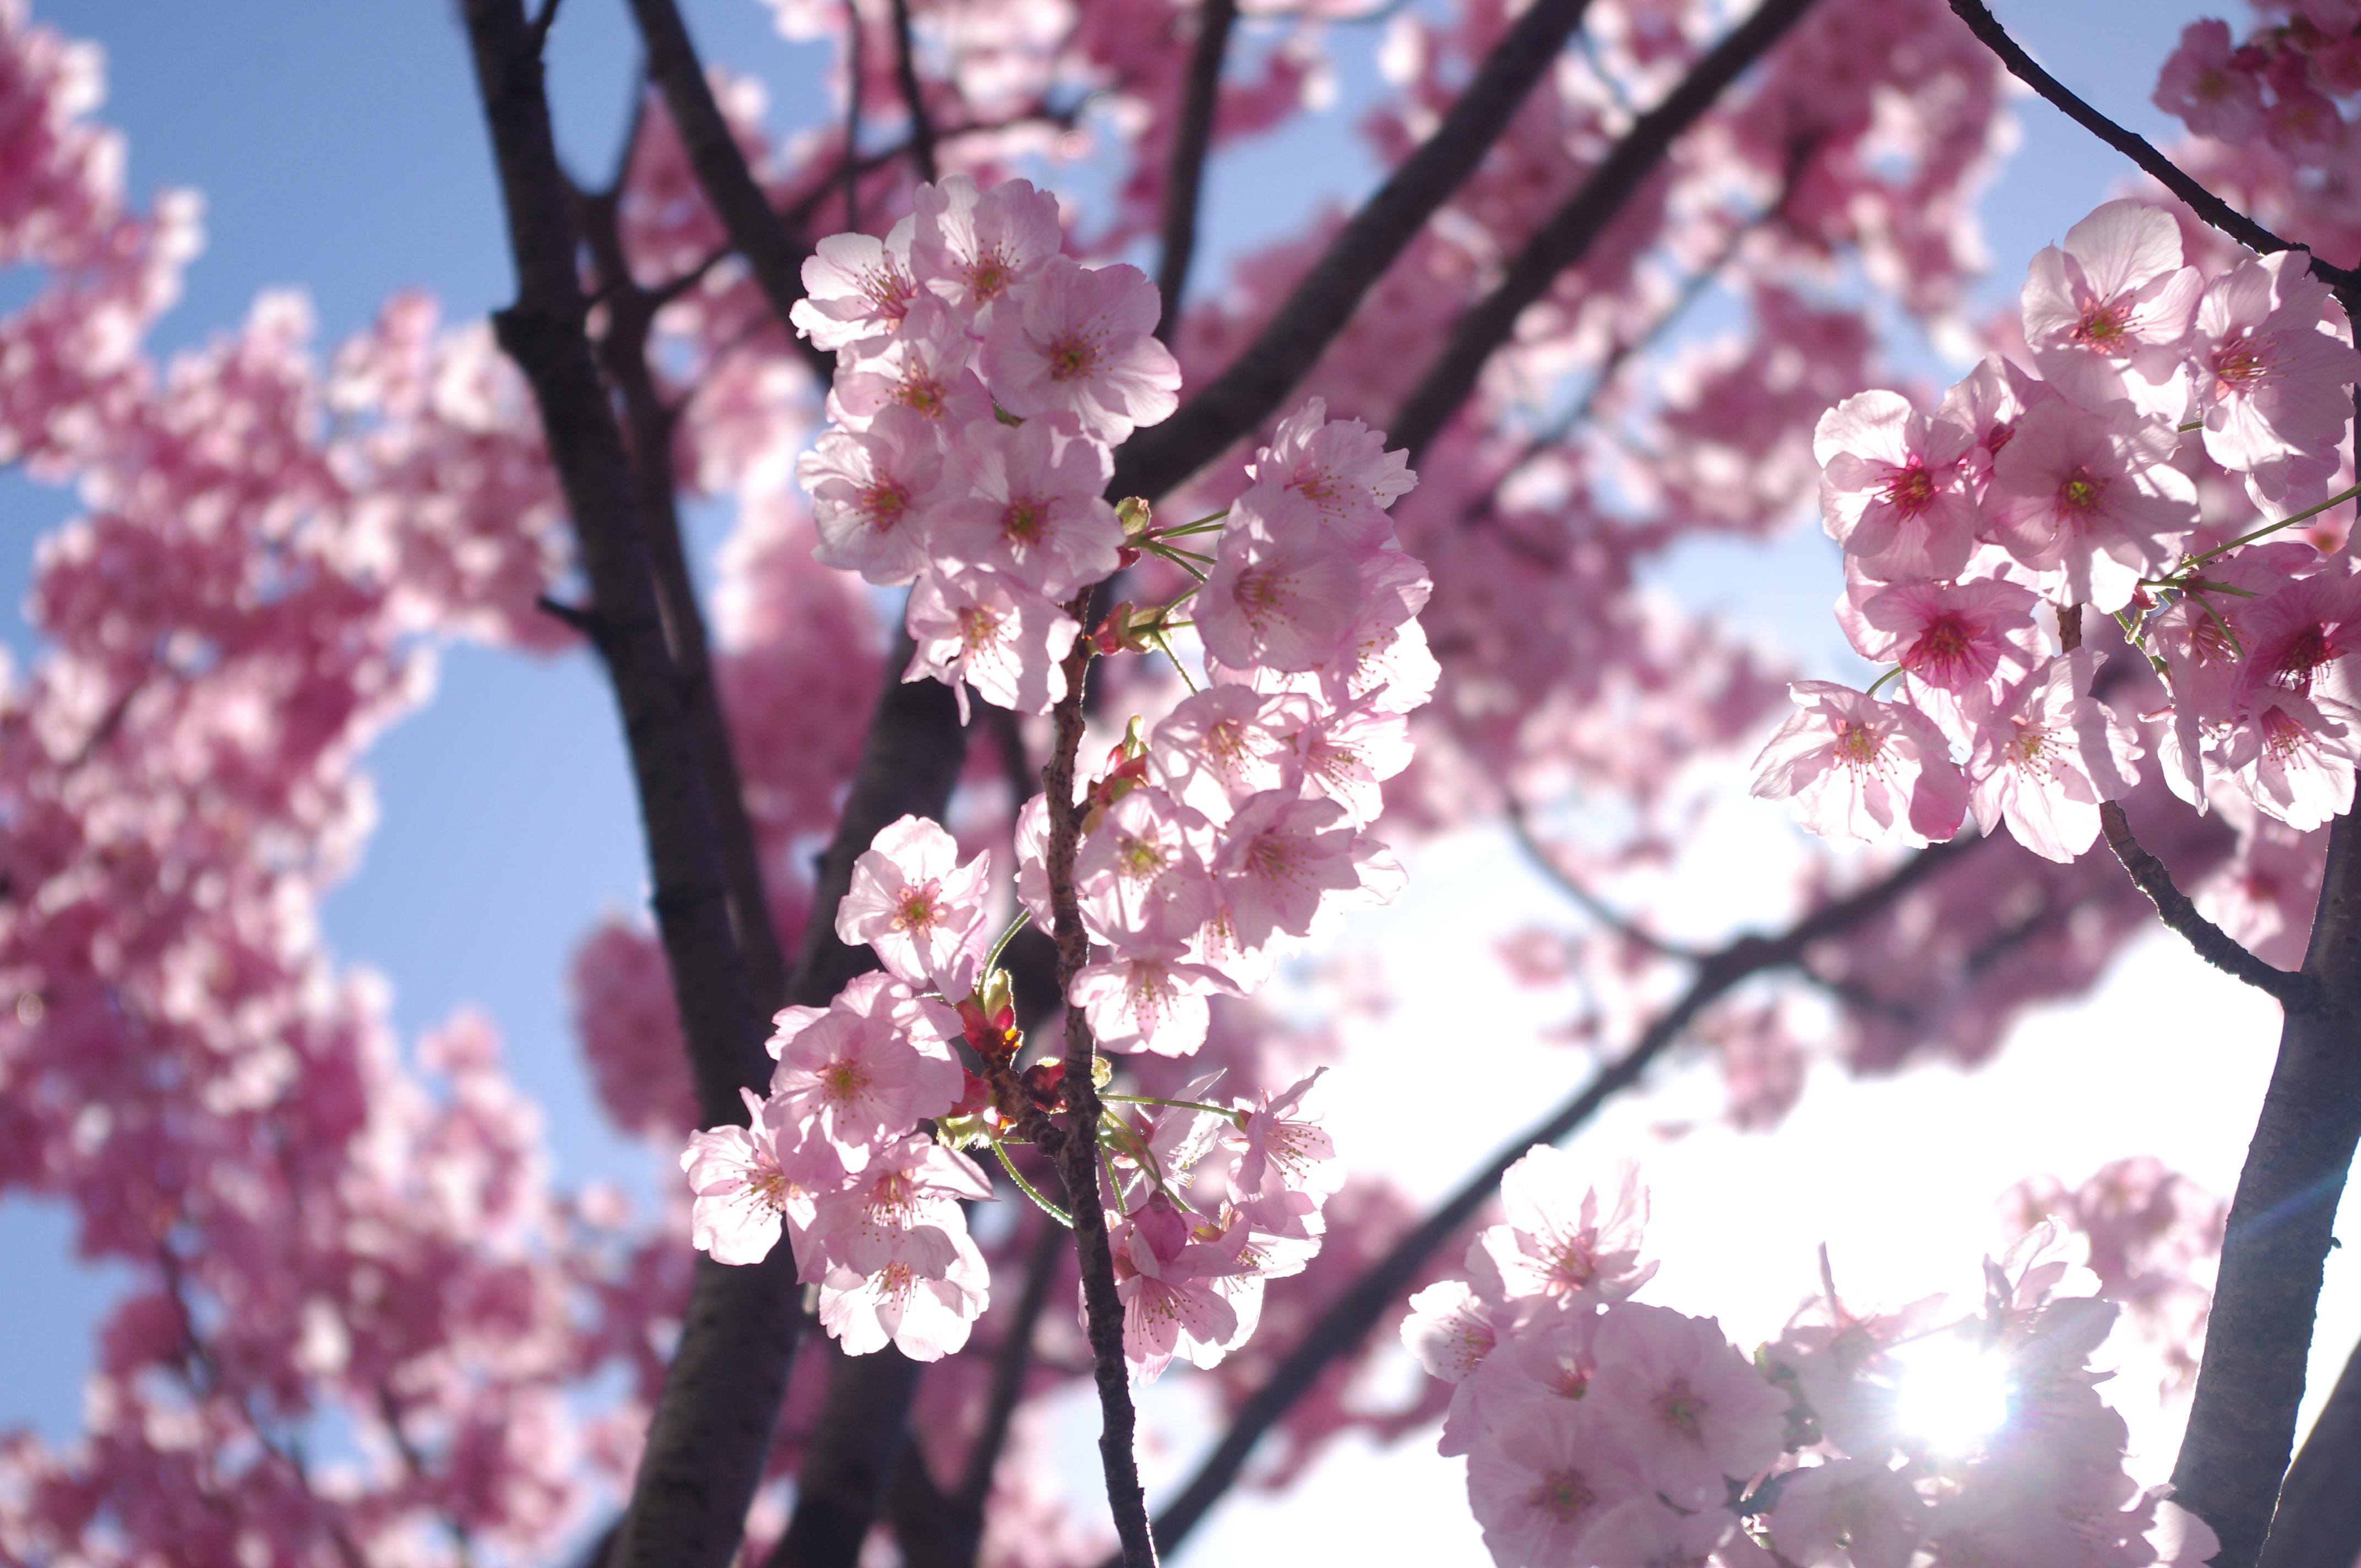 Wallpaper Mekar Berwarna Merah Muda Cabang Musim Semi Bunga